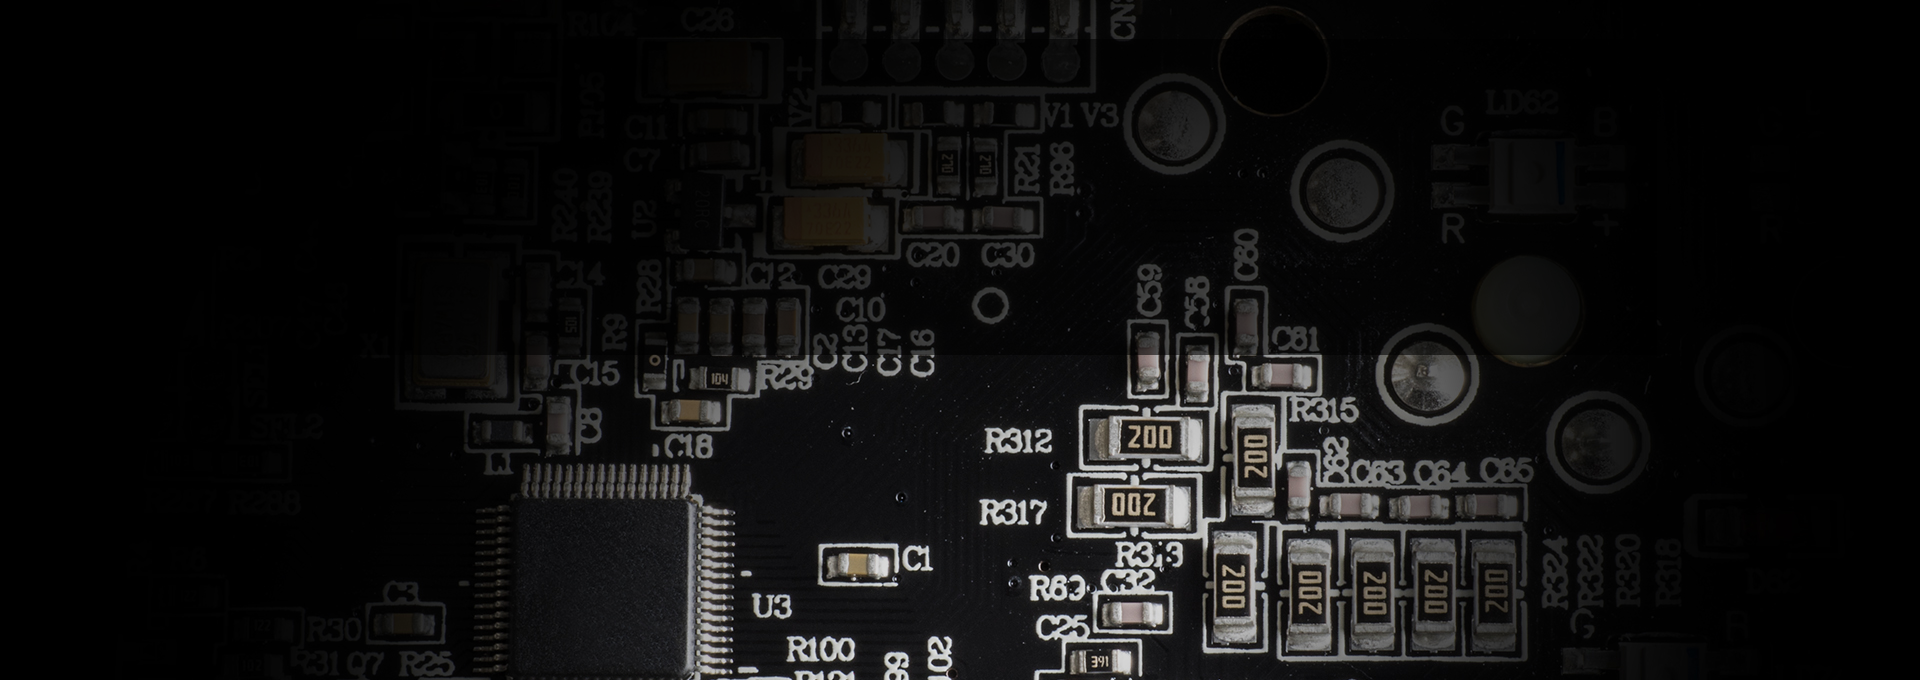 mk730-7-bannerdesktop.png [MS-15481123719086096-0097873688-FR]/Catalogue produit / Online